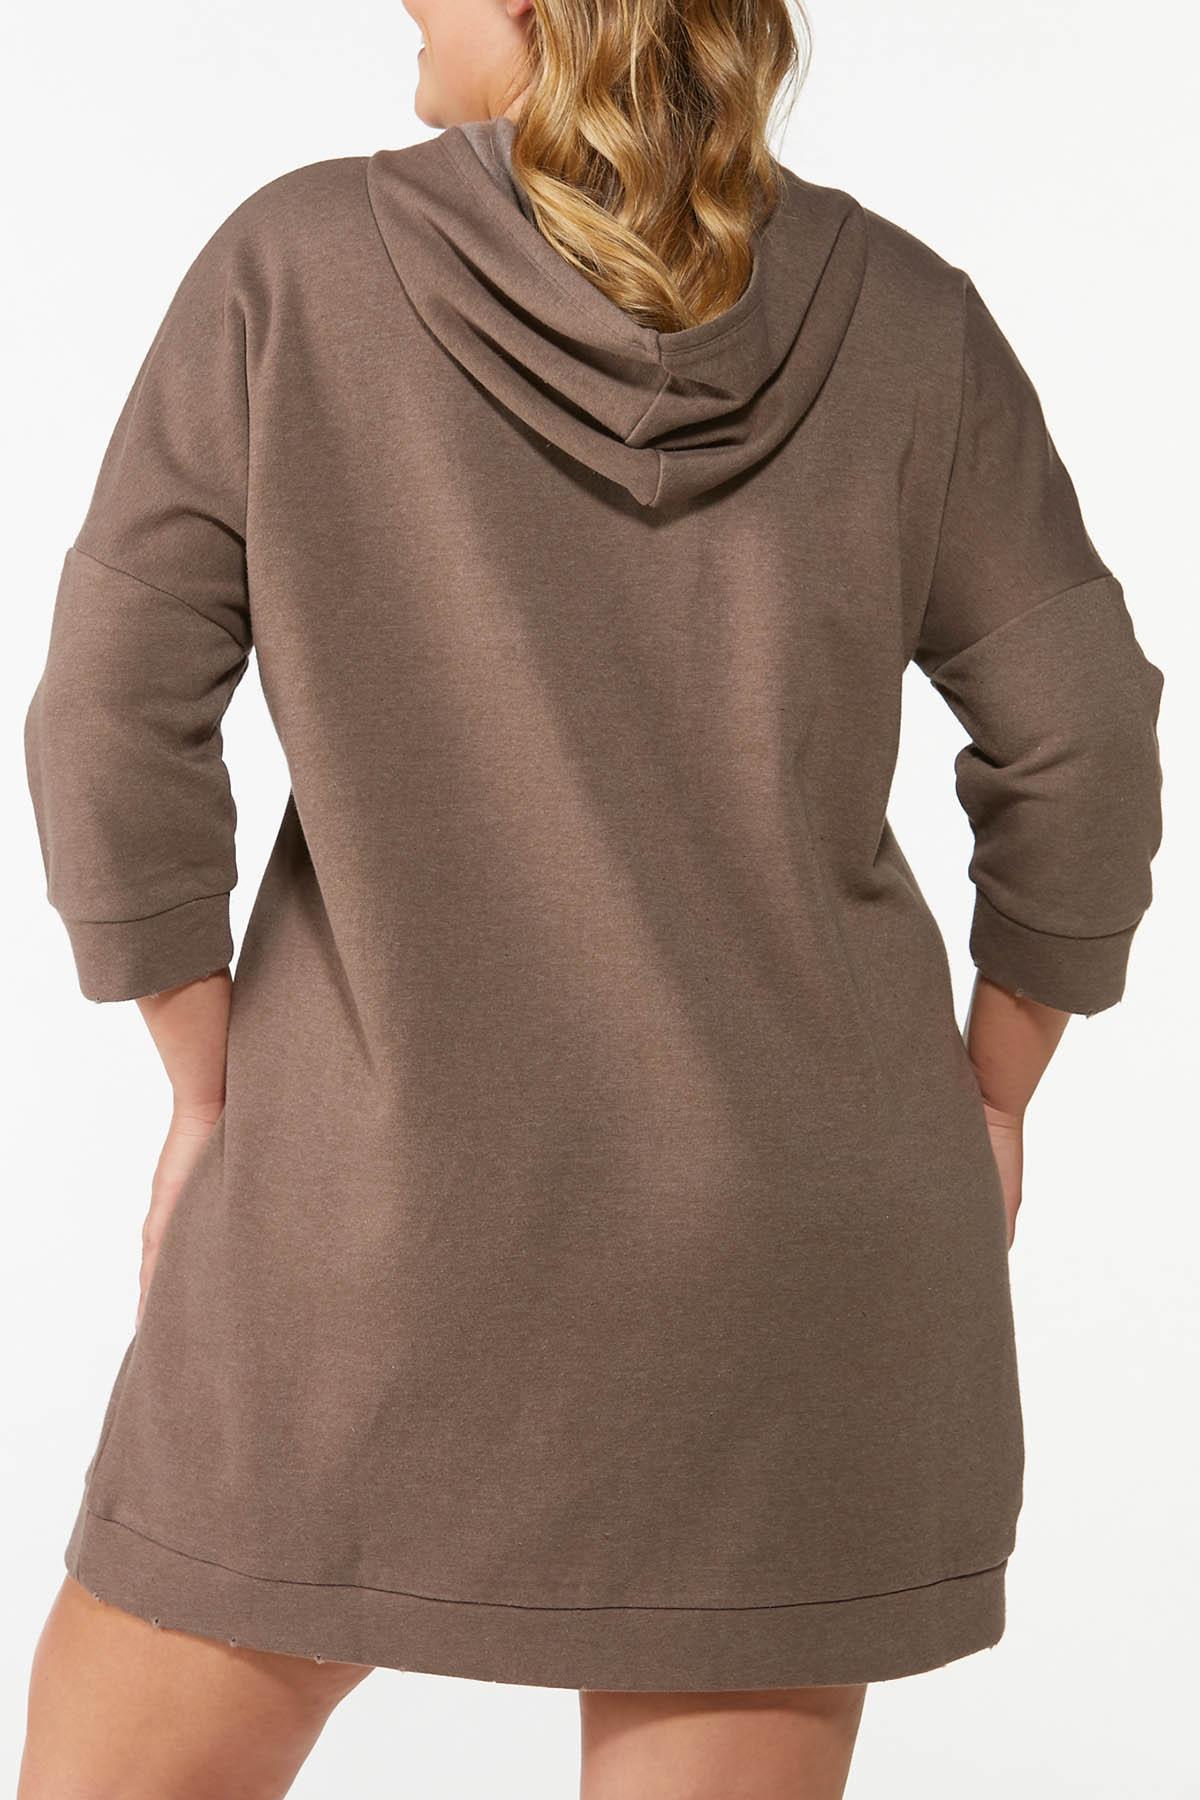 Plus Size Hooded Sweatshirt Dress (Item #44675669)